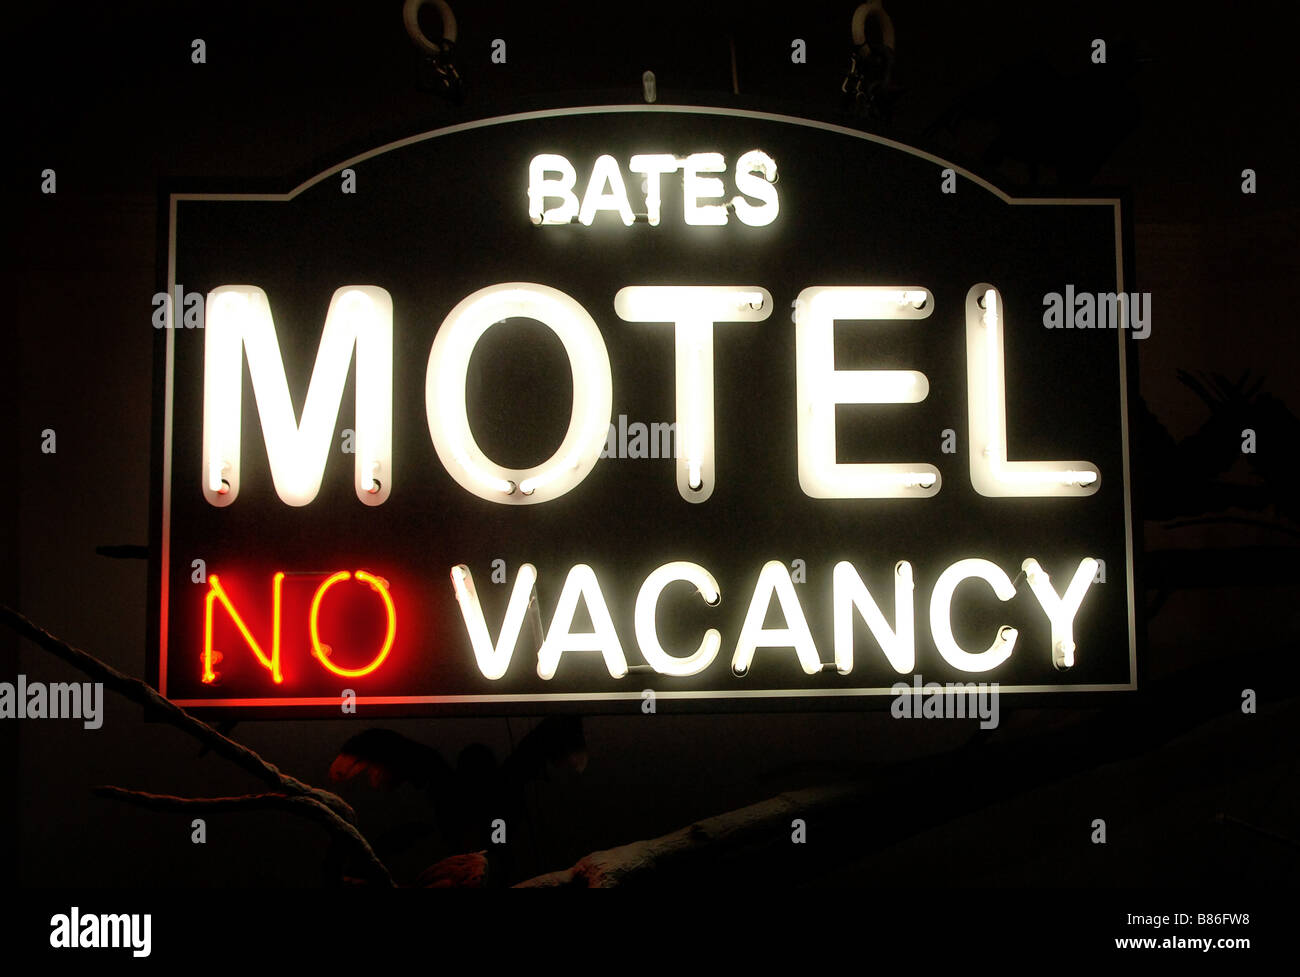 Bates Motel London Mdm Tussauds Sign - Stock Image